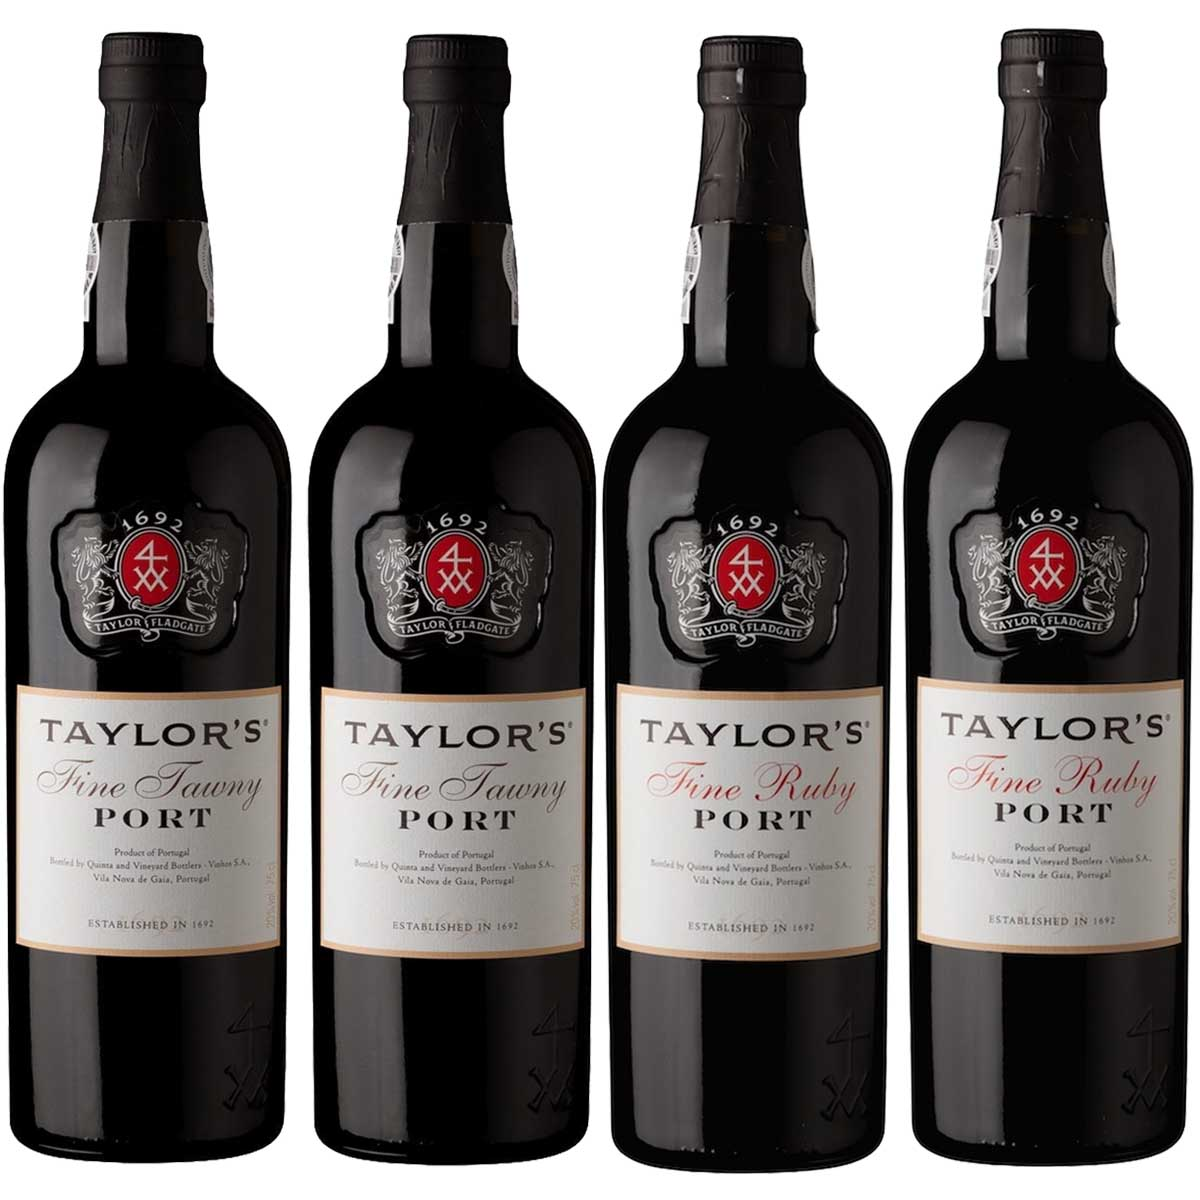 Kit 4x Vinho do Porto Tinto Ruby e Tawny Taylor's Português